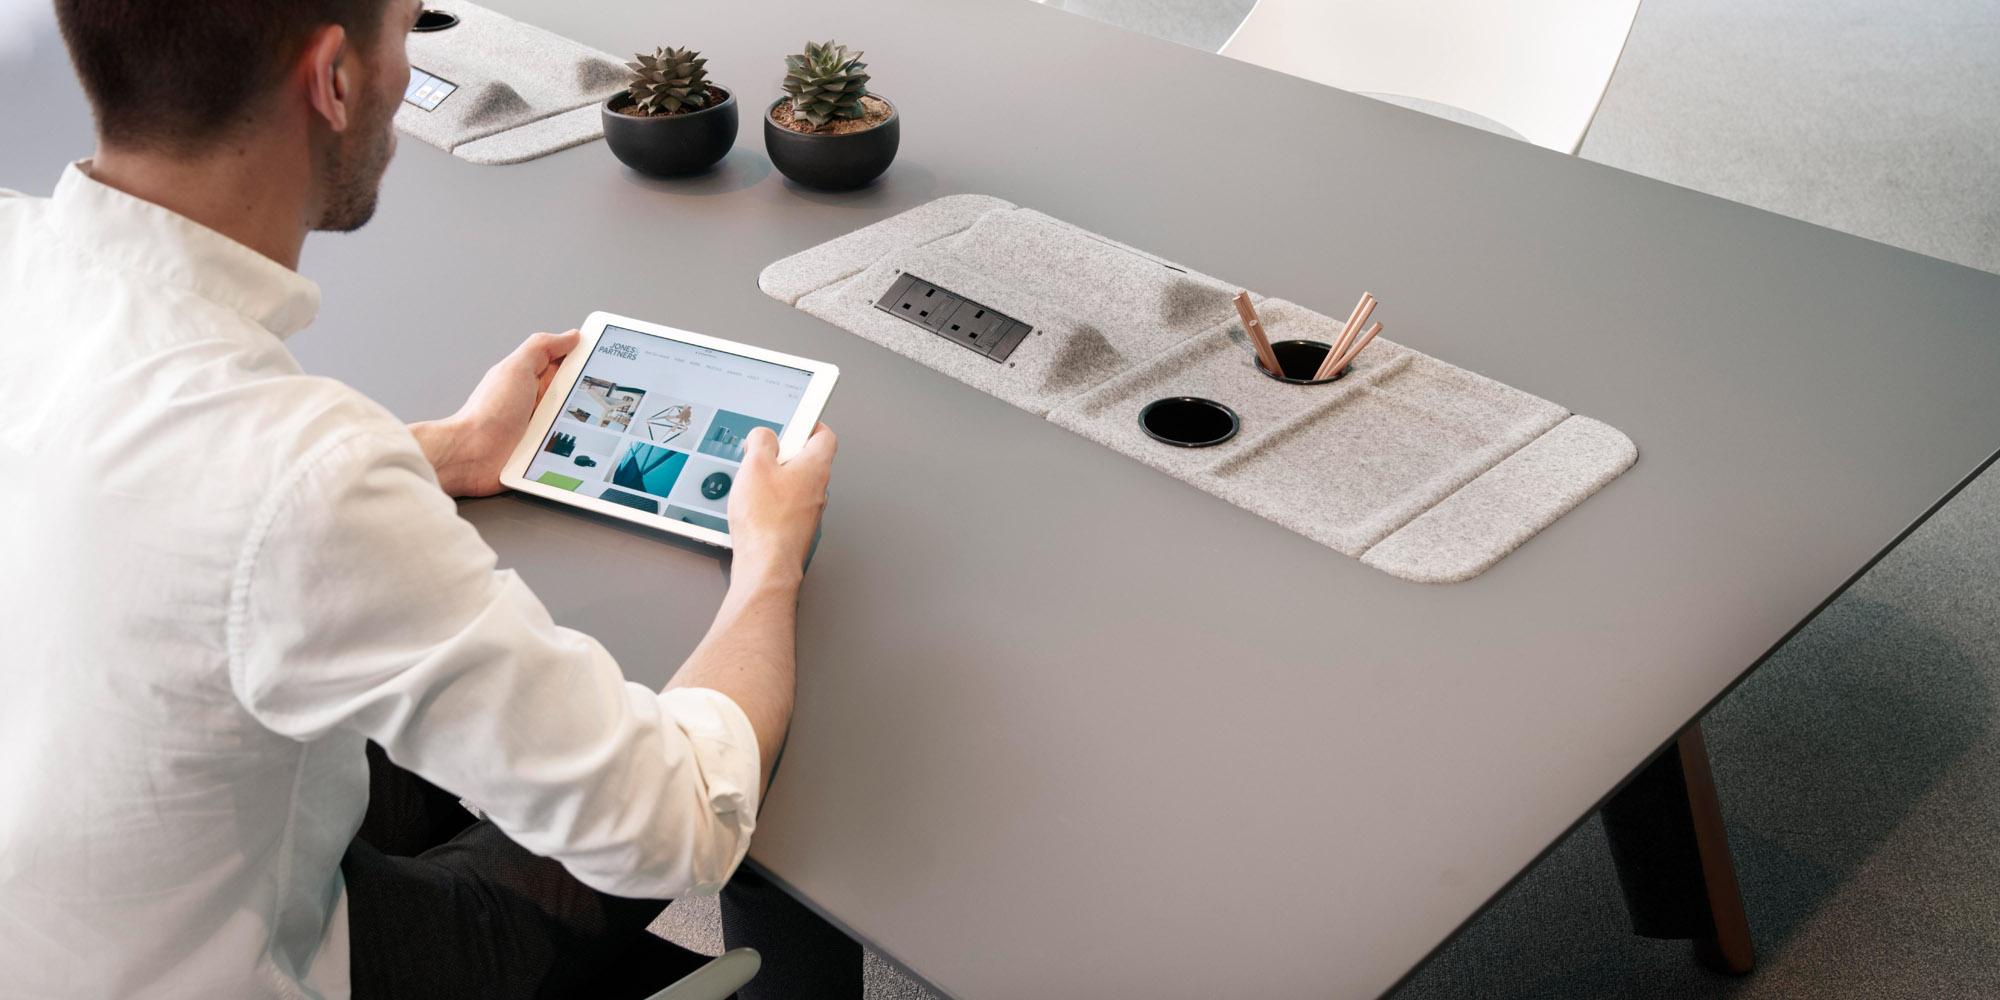 Jones-and-Partners-focus-office-furniture-7.jpg